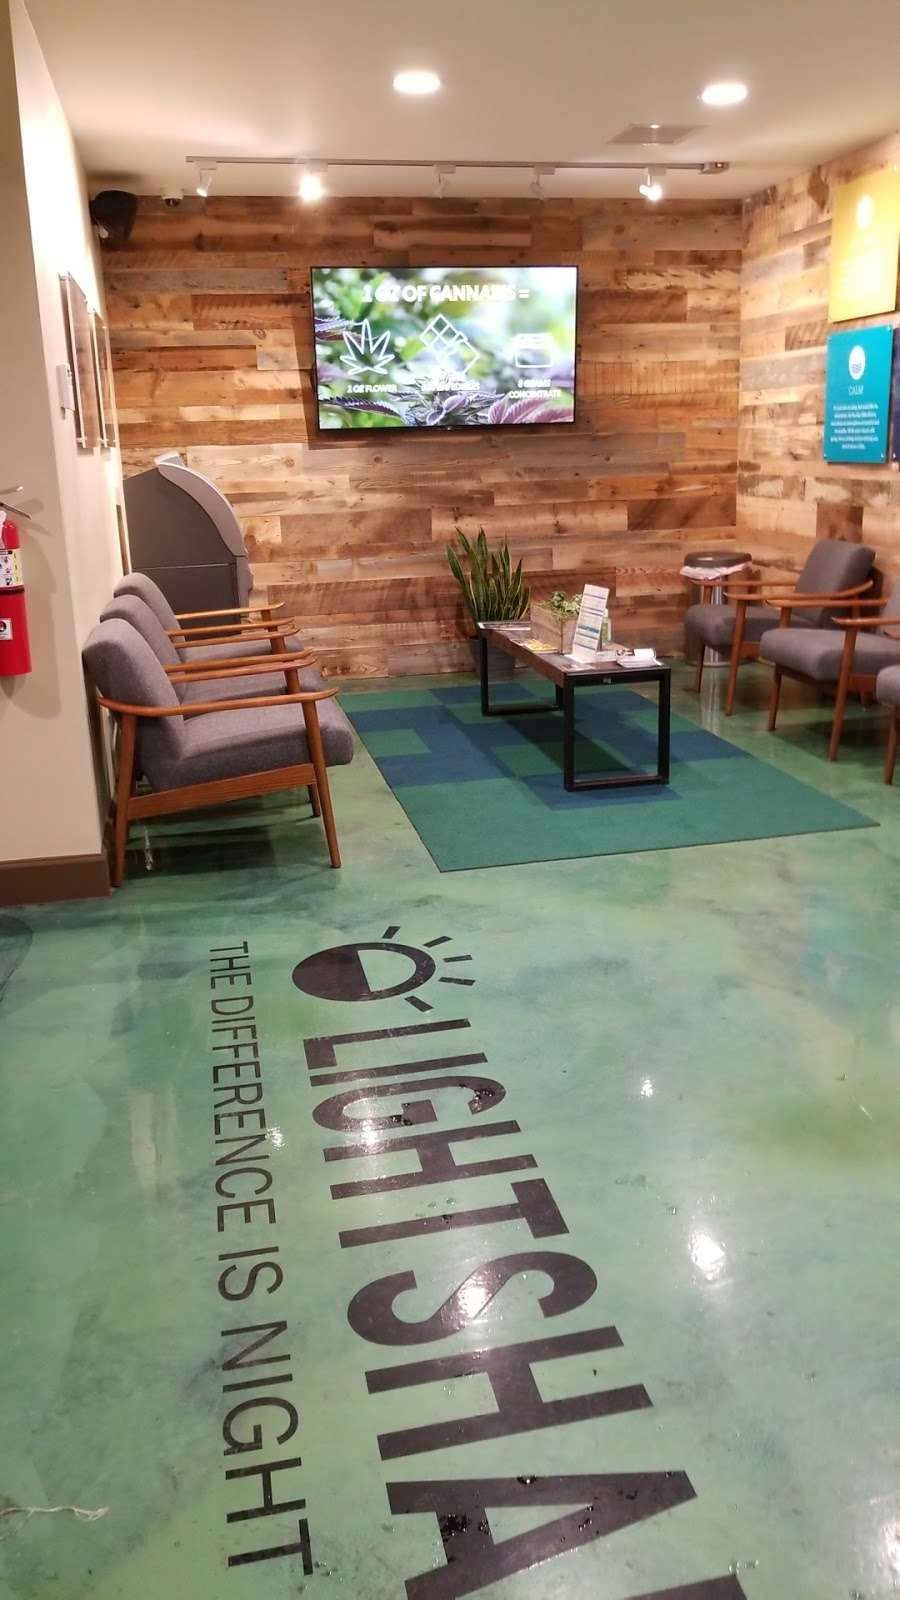 Lightshade Rec & Med Dispensary - health  | Photo 10 of 10 | Address: 330 S Dayton St, Denver, CO 80247, USA | Phone: (720) 699-2690